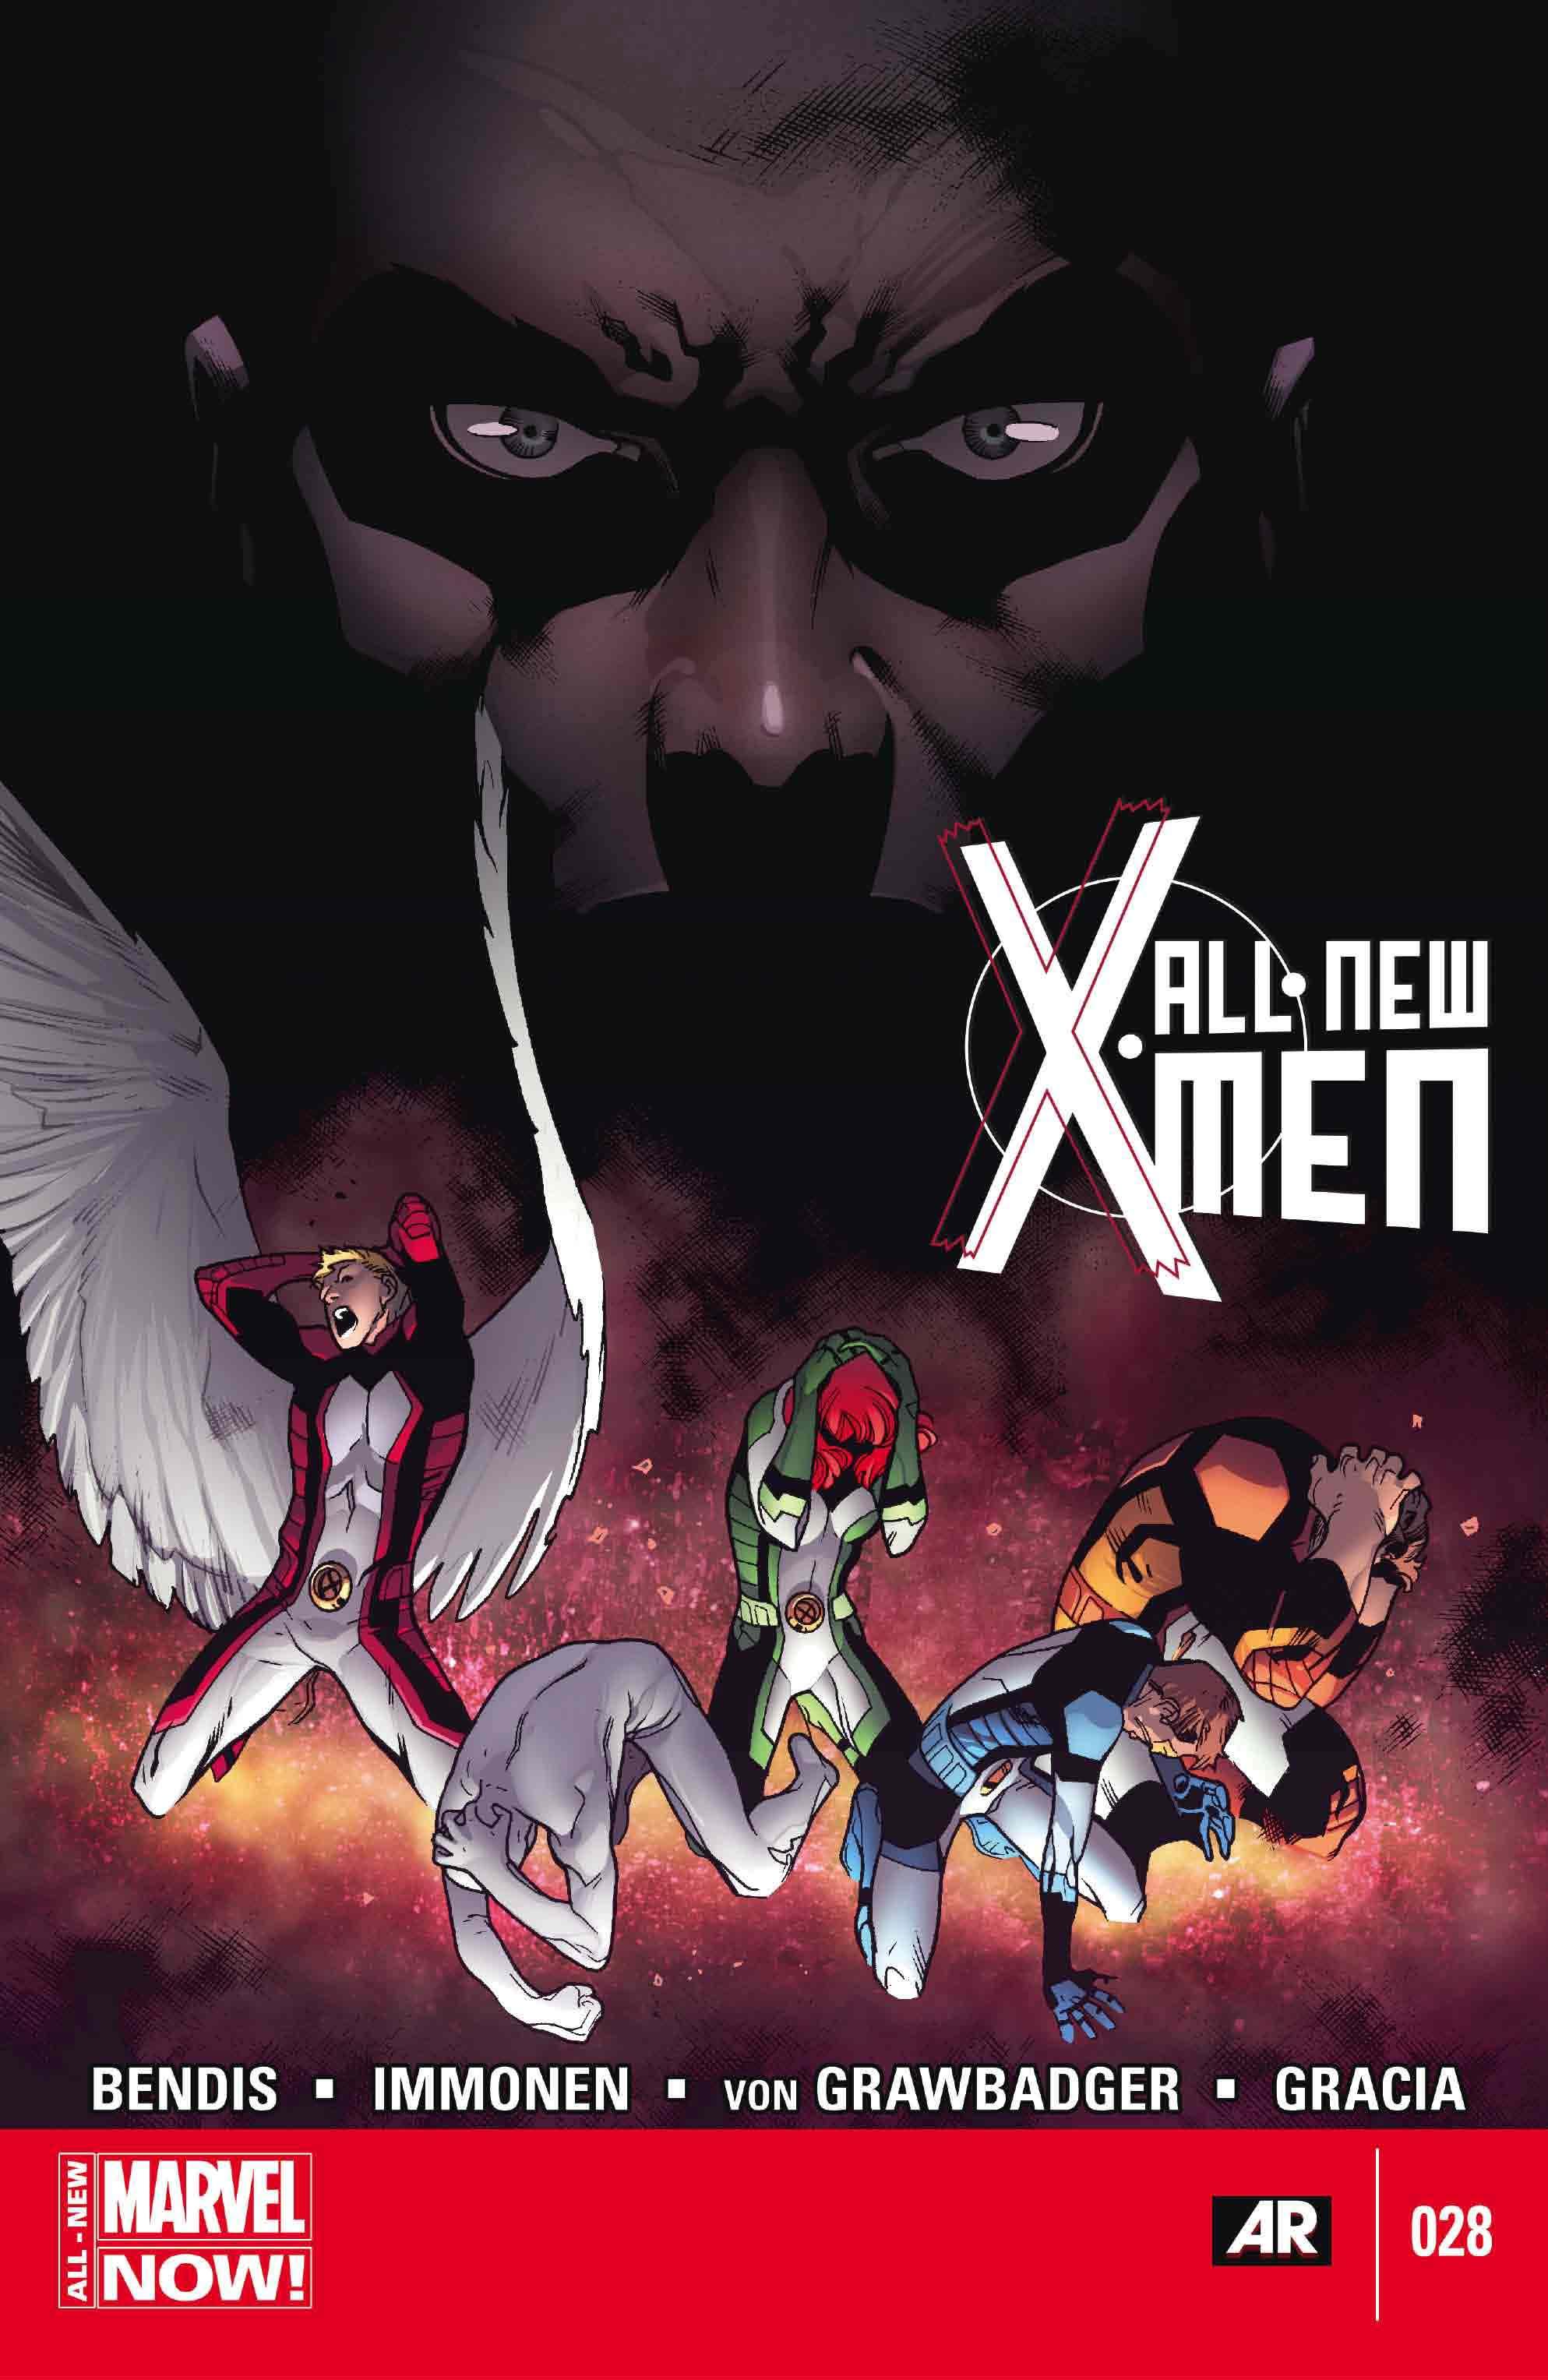 'All-New X-Men' #28 cover by Stuart Immonen, Wade Von Grawbadger & Marte Gracia